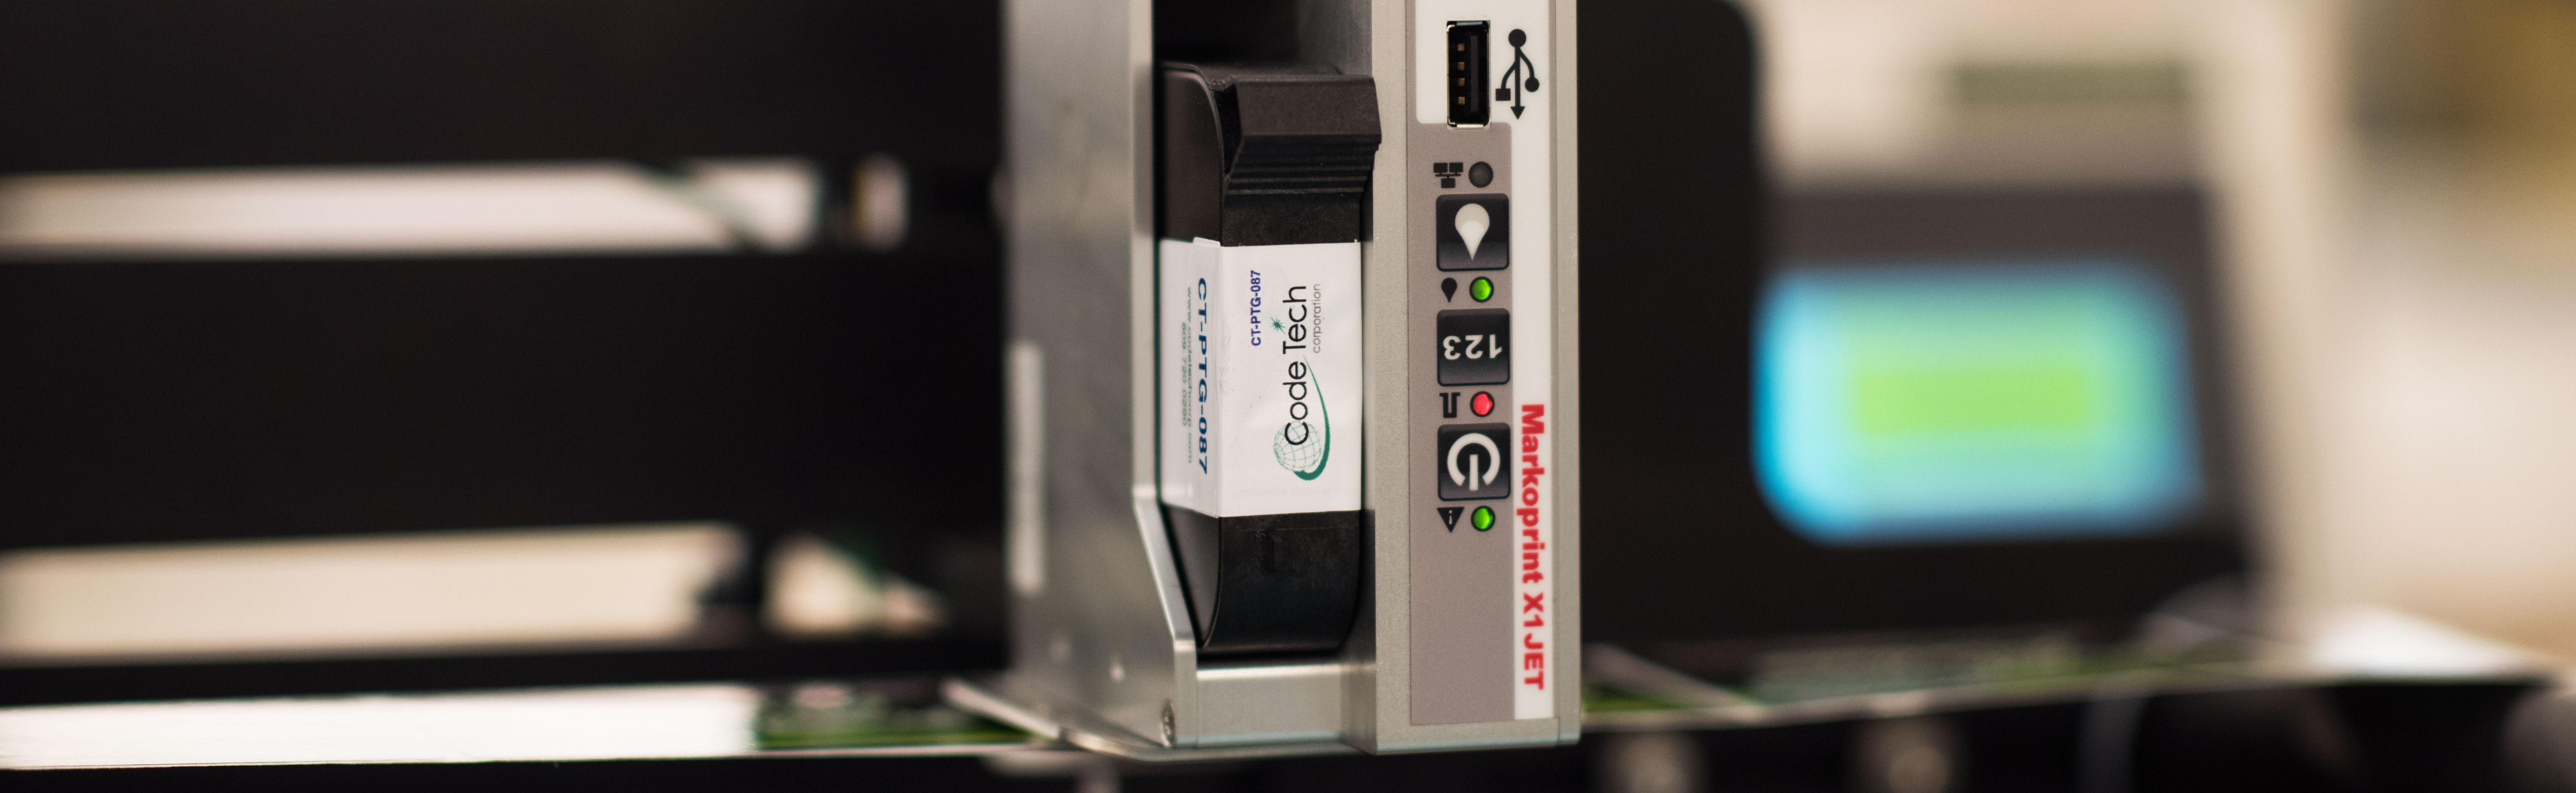 Thermal ink jet printer cartridge